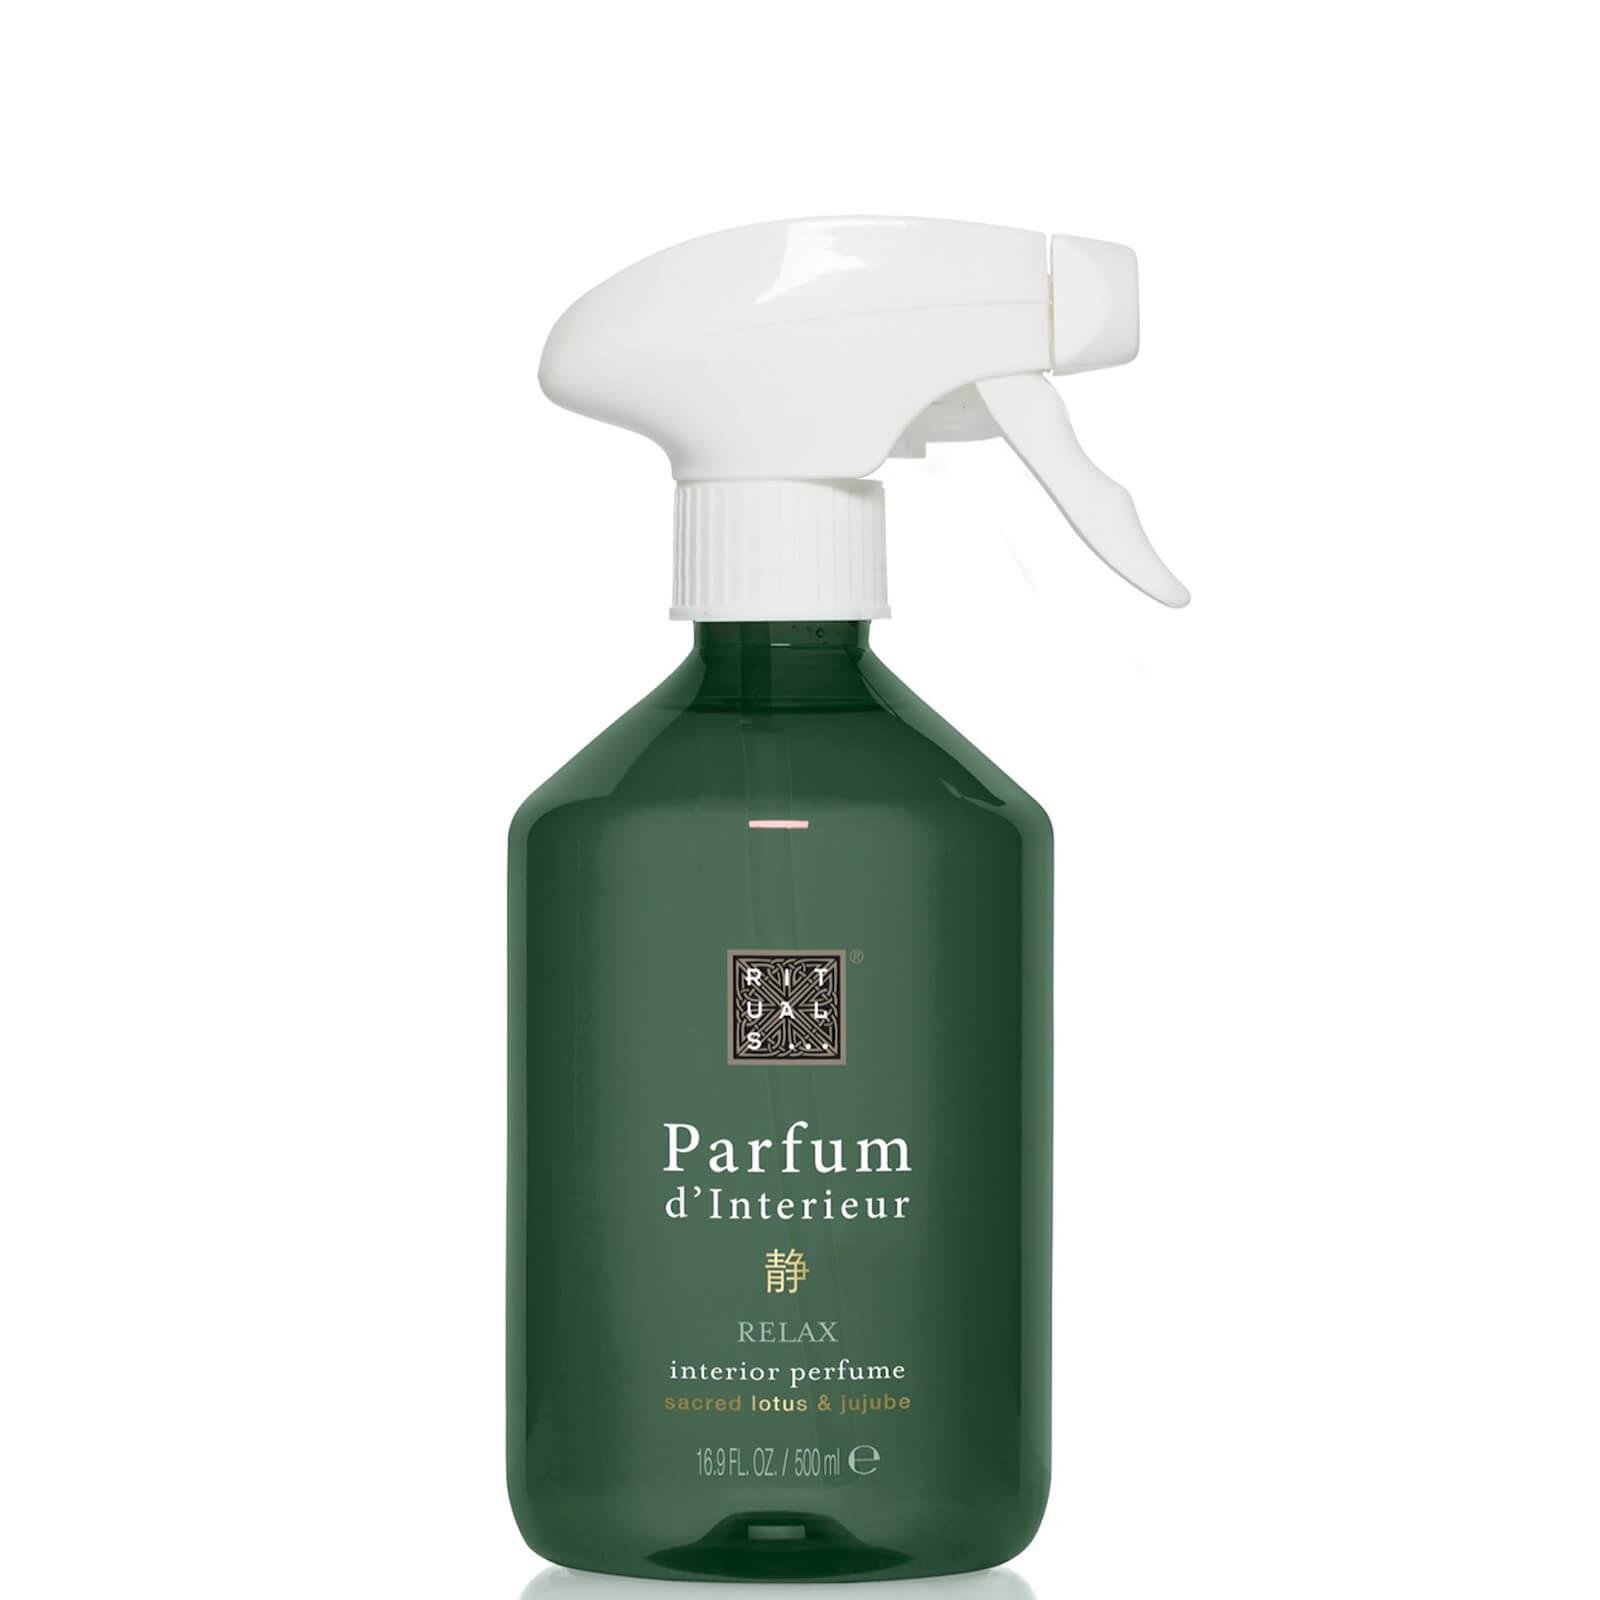 Rituals The Ritual of Jing d'Interieur Parfum 500ml